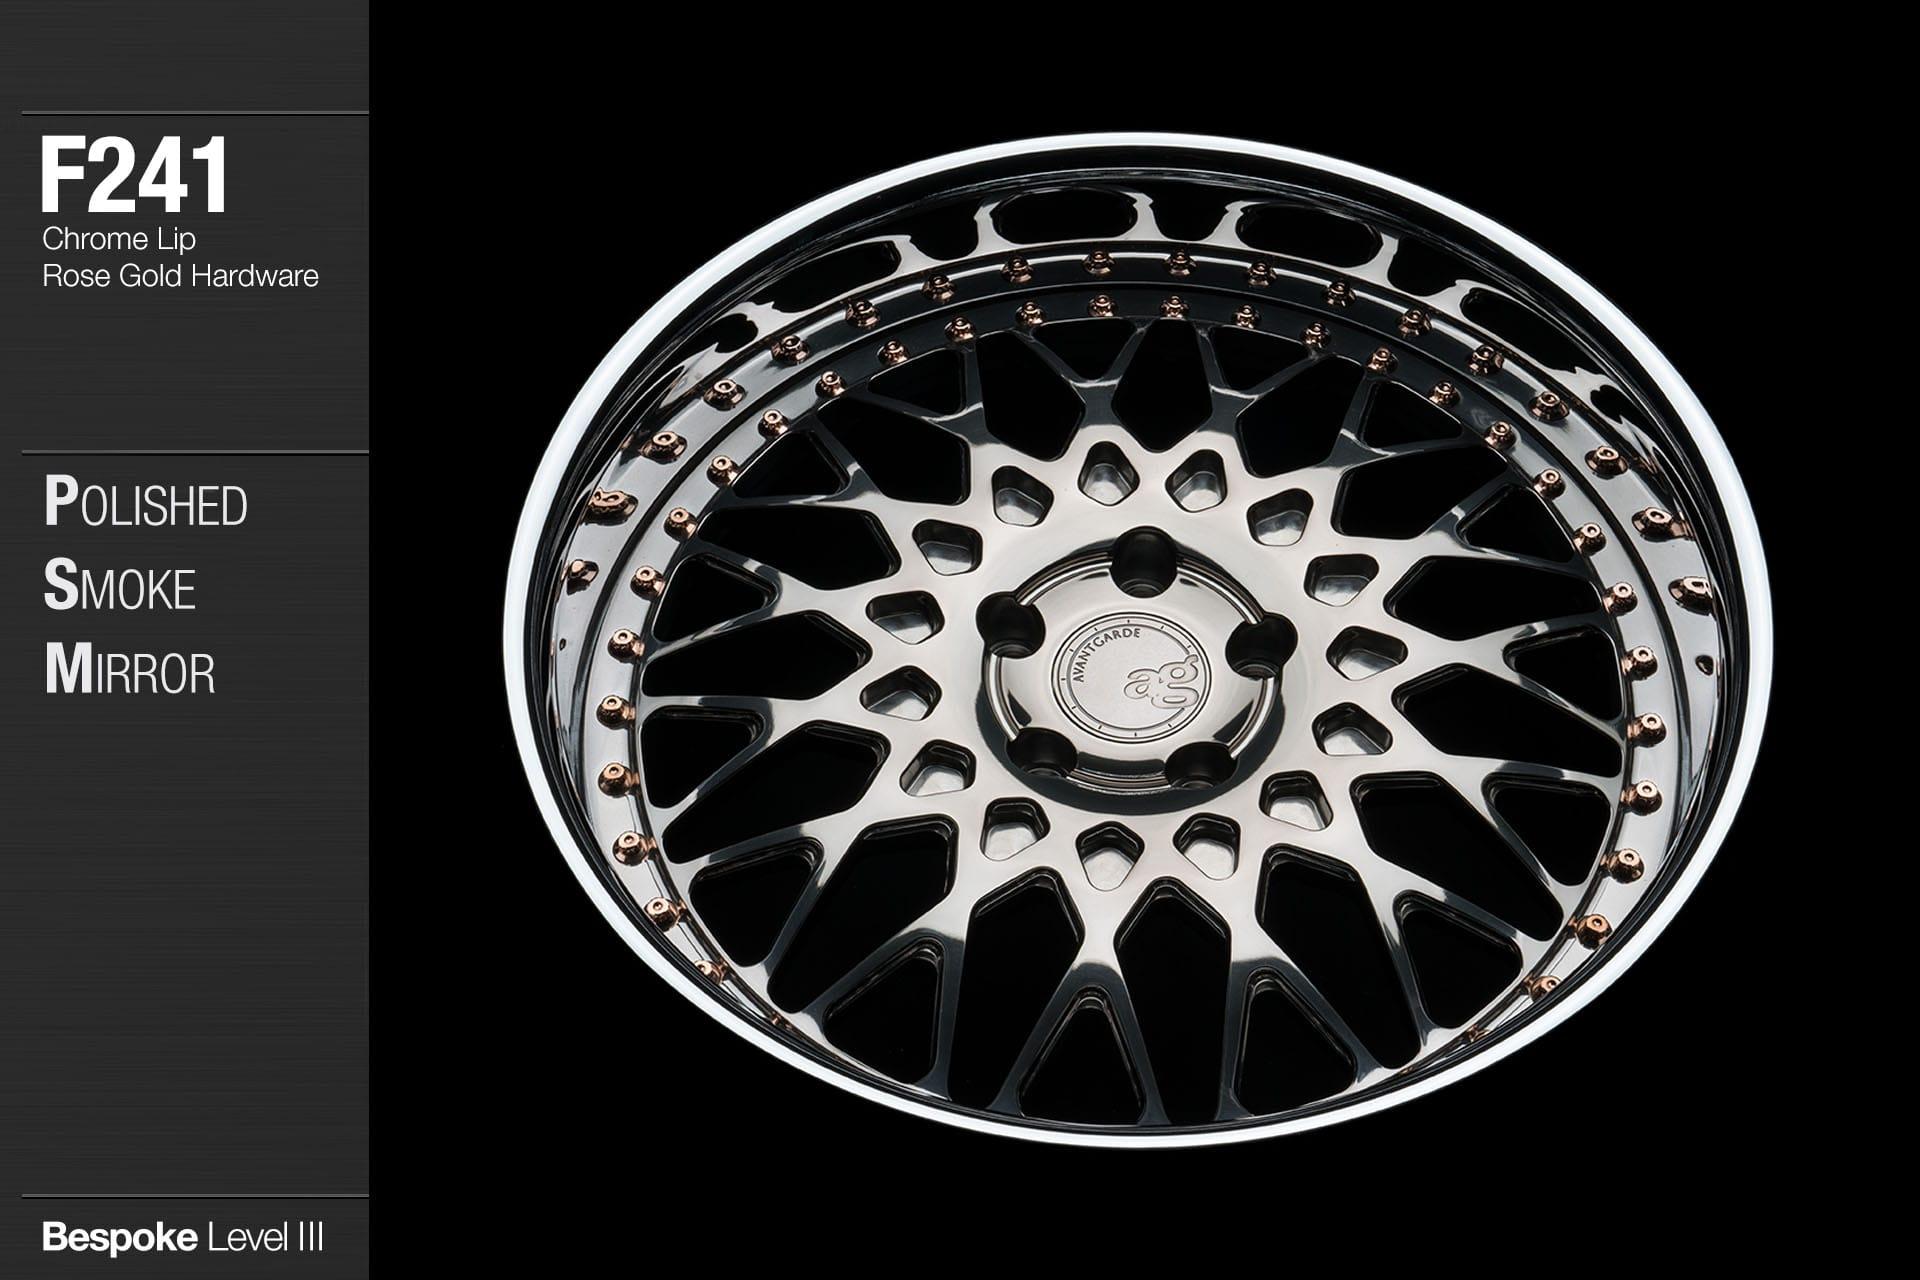 avant-garde-ag-wheels-f241-polished-smoke-mirror-face-chrome-lip-rose-gold-hardware-3-min